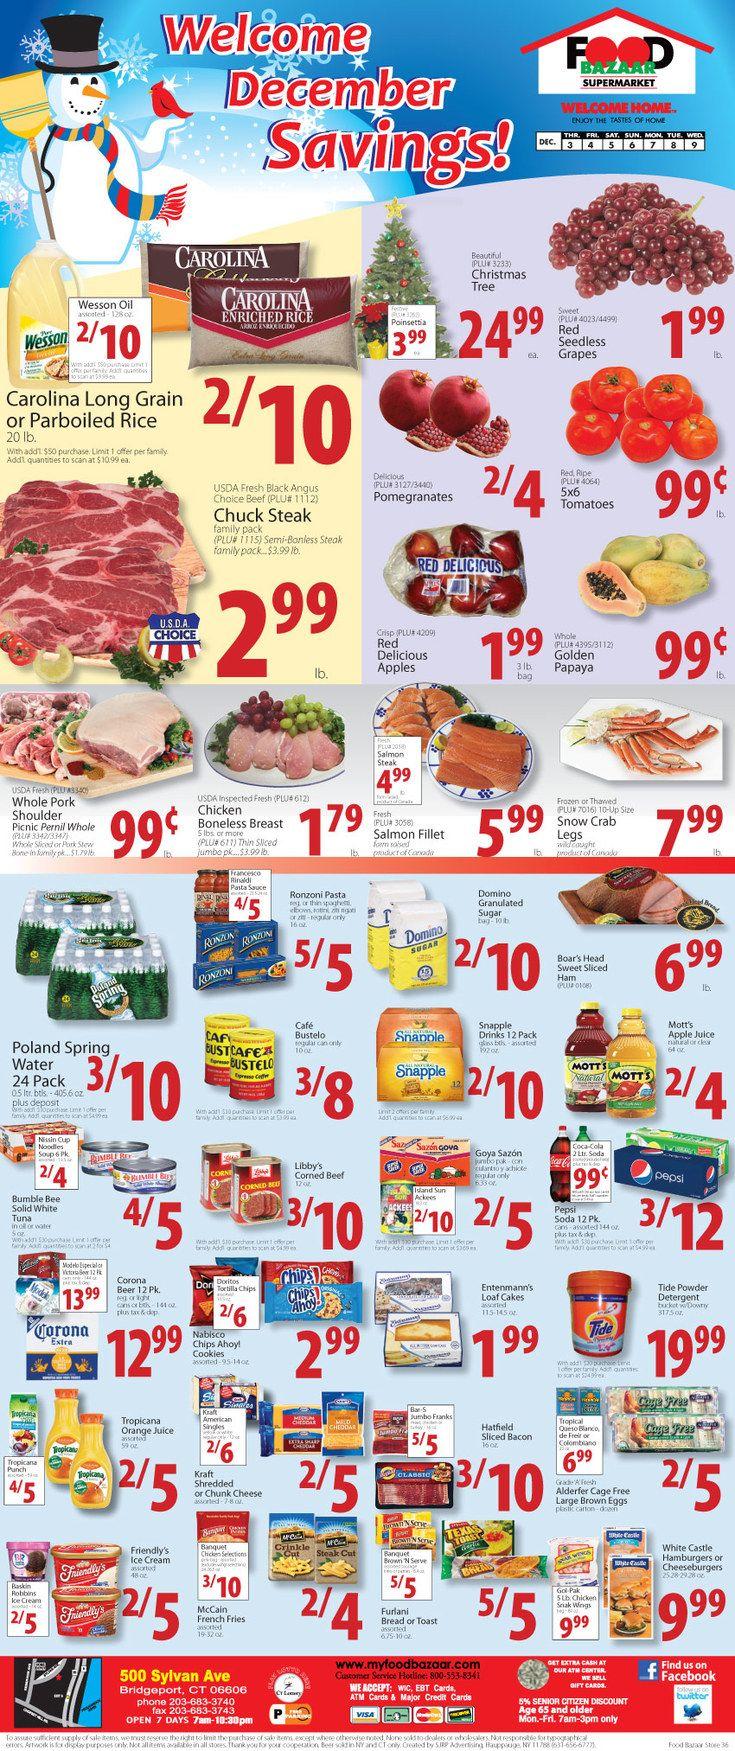 Food bazaar circular november 27 december 2 2015